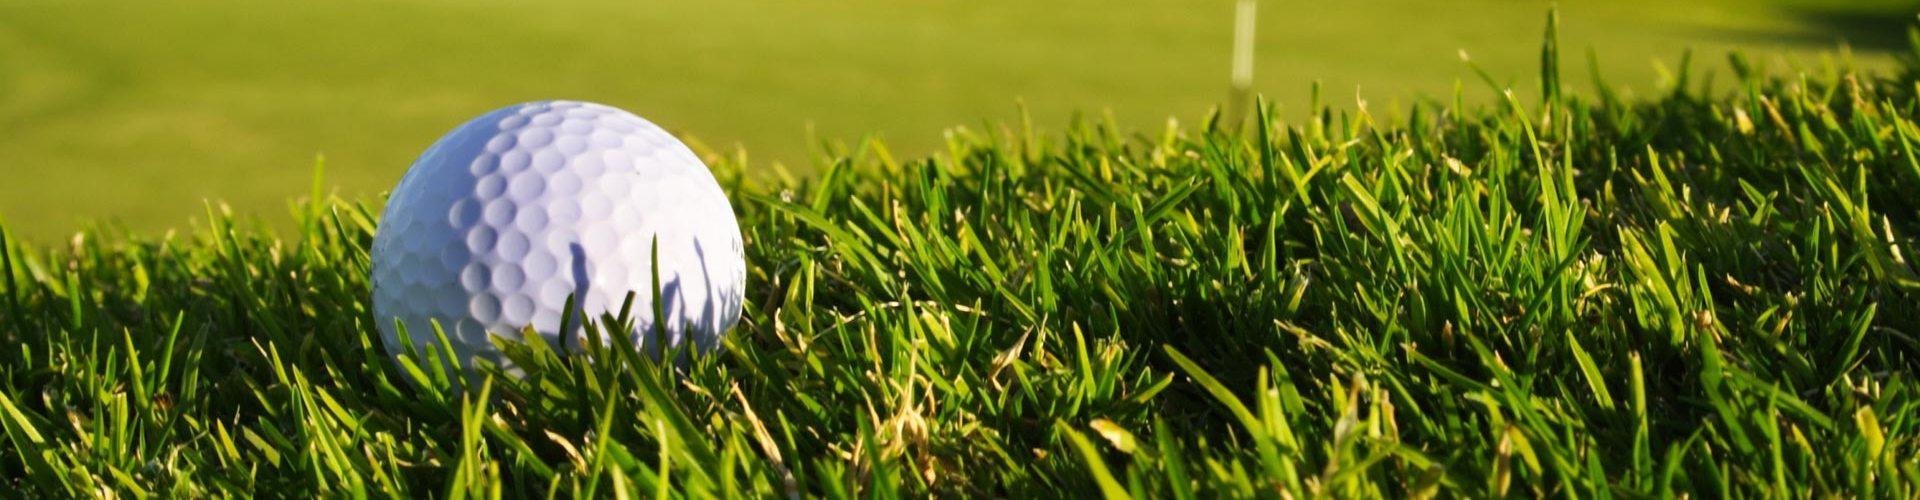 Golfguiden online   golfguide skandinavien   golfguiden online.se